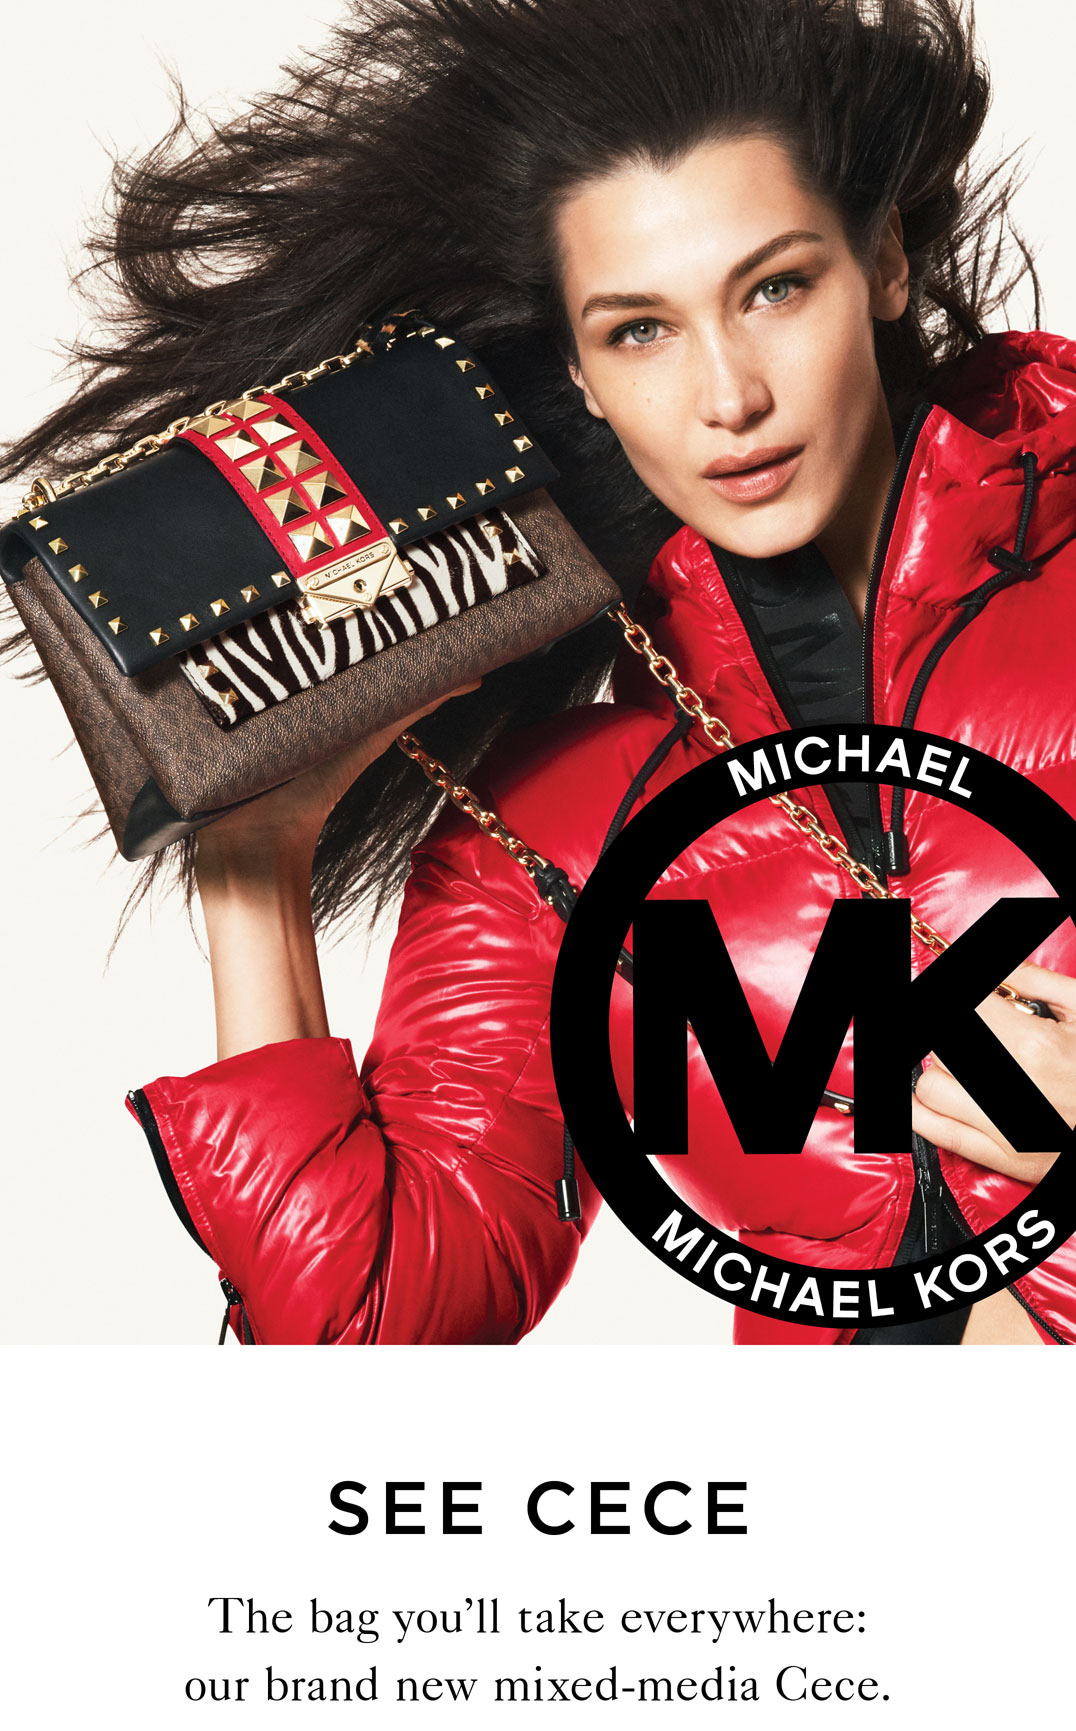 Michael Kors Cece Me Milled